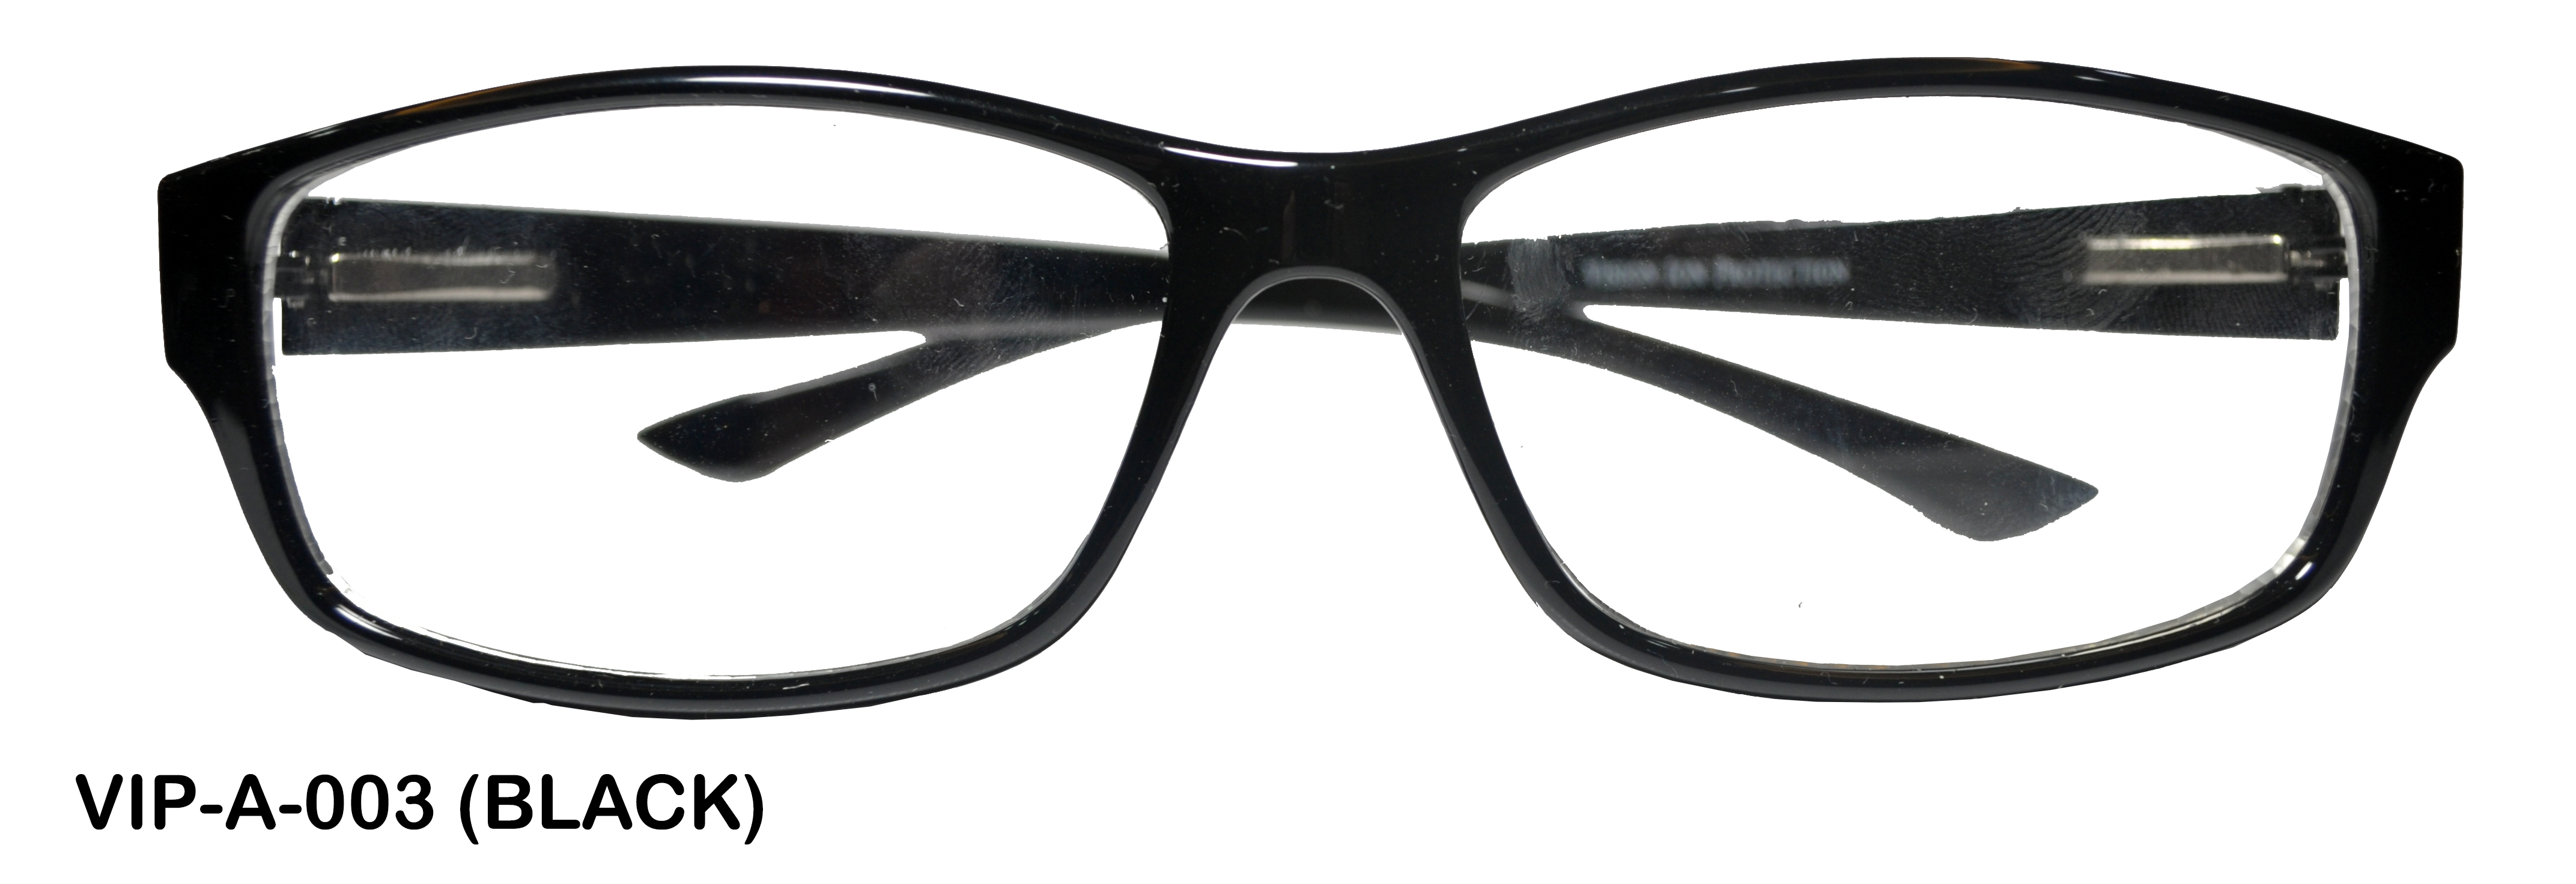 vip-a-003-black